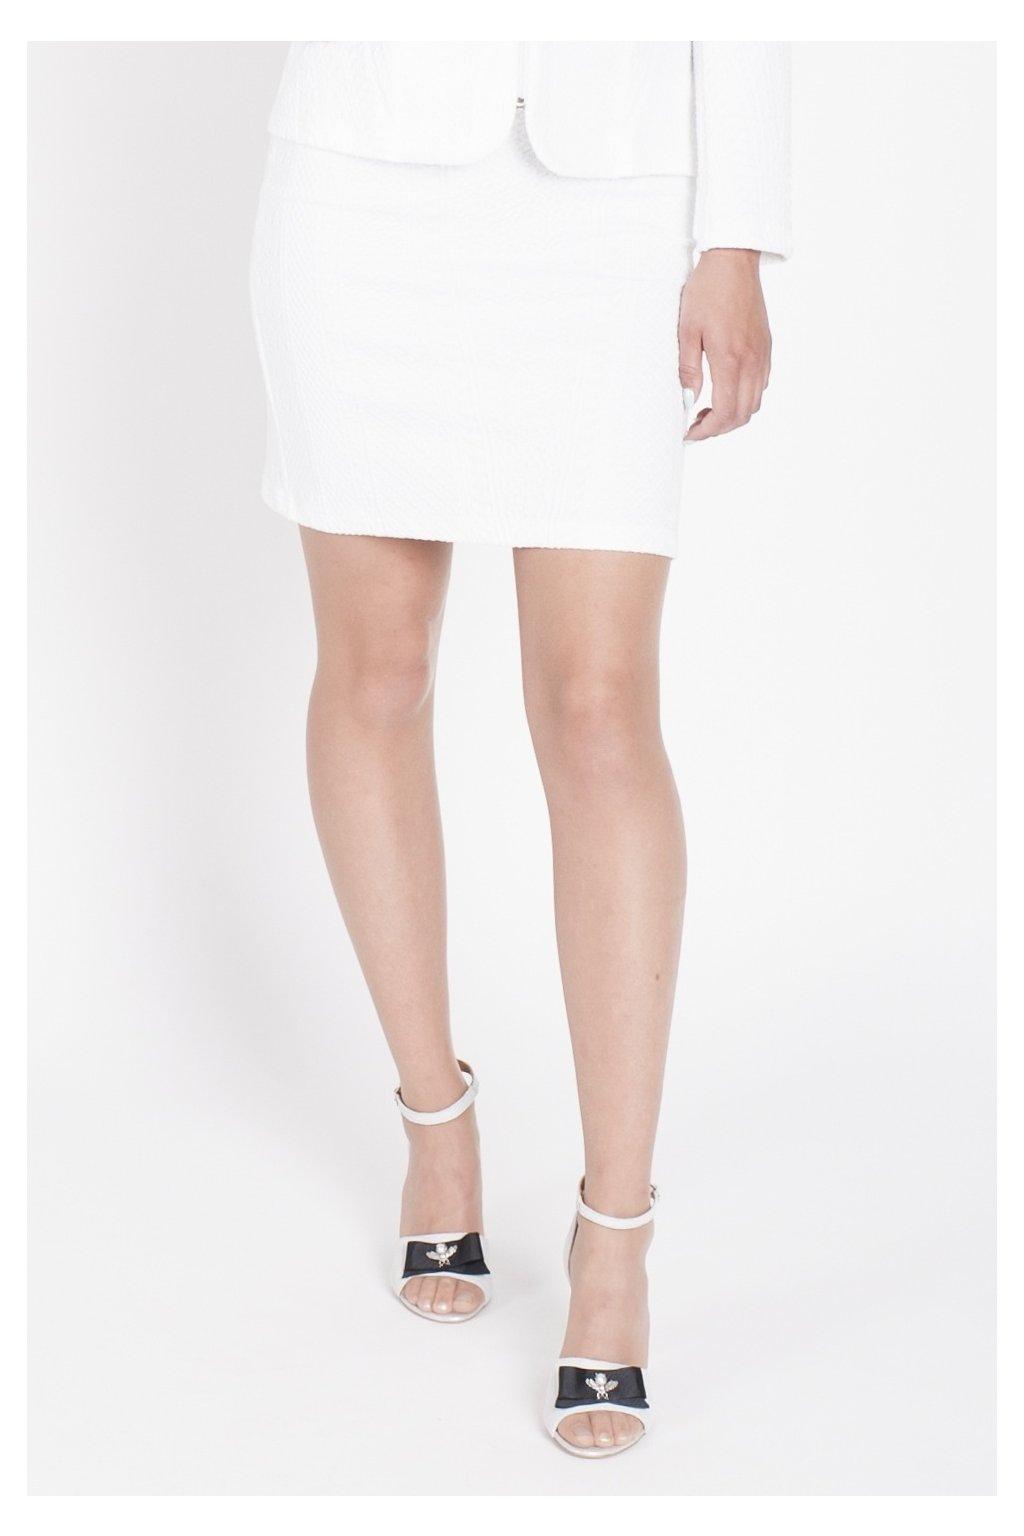 biela-dámska-sukňa-favab.sk.jpg